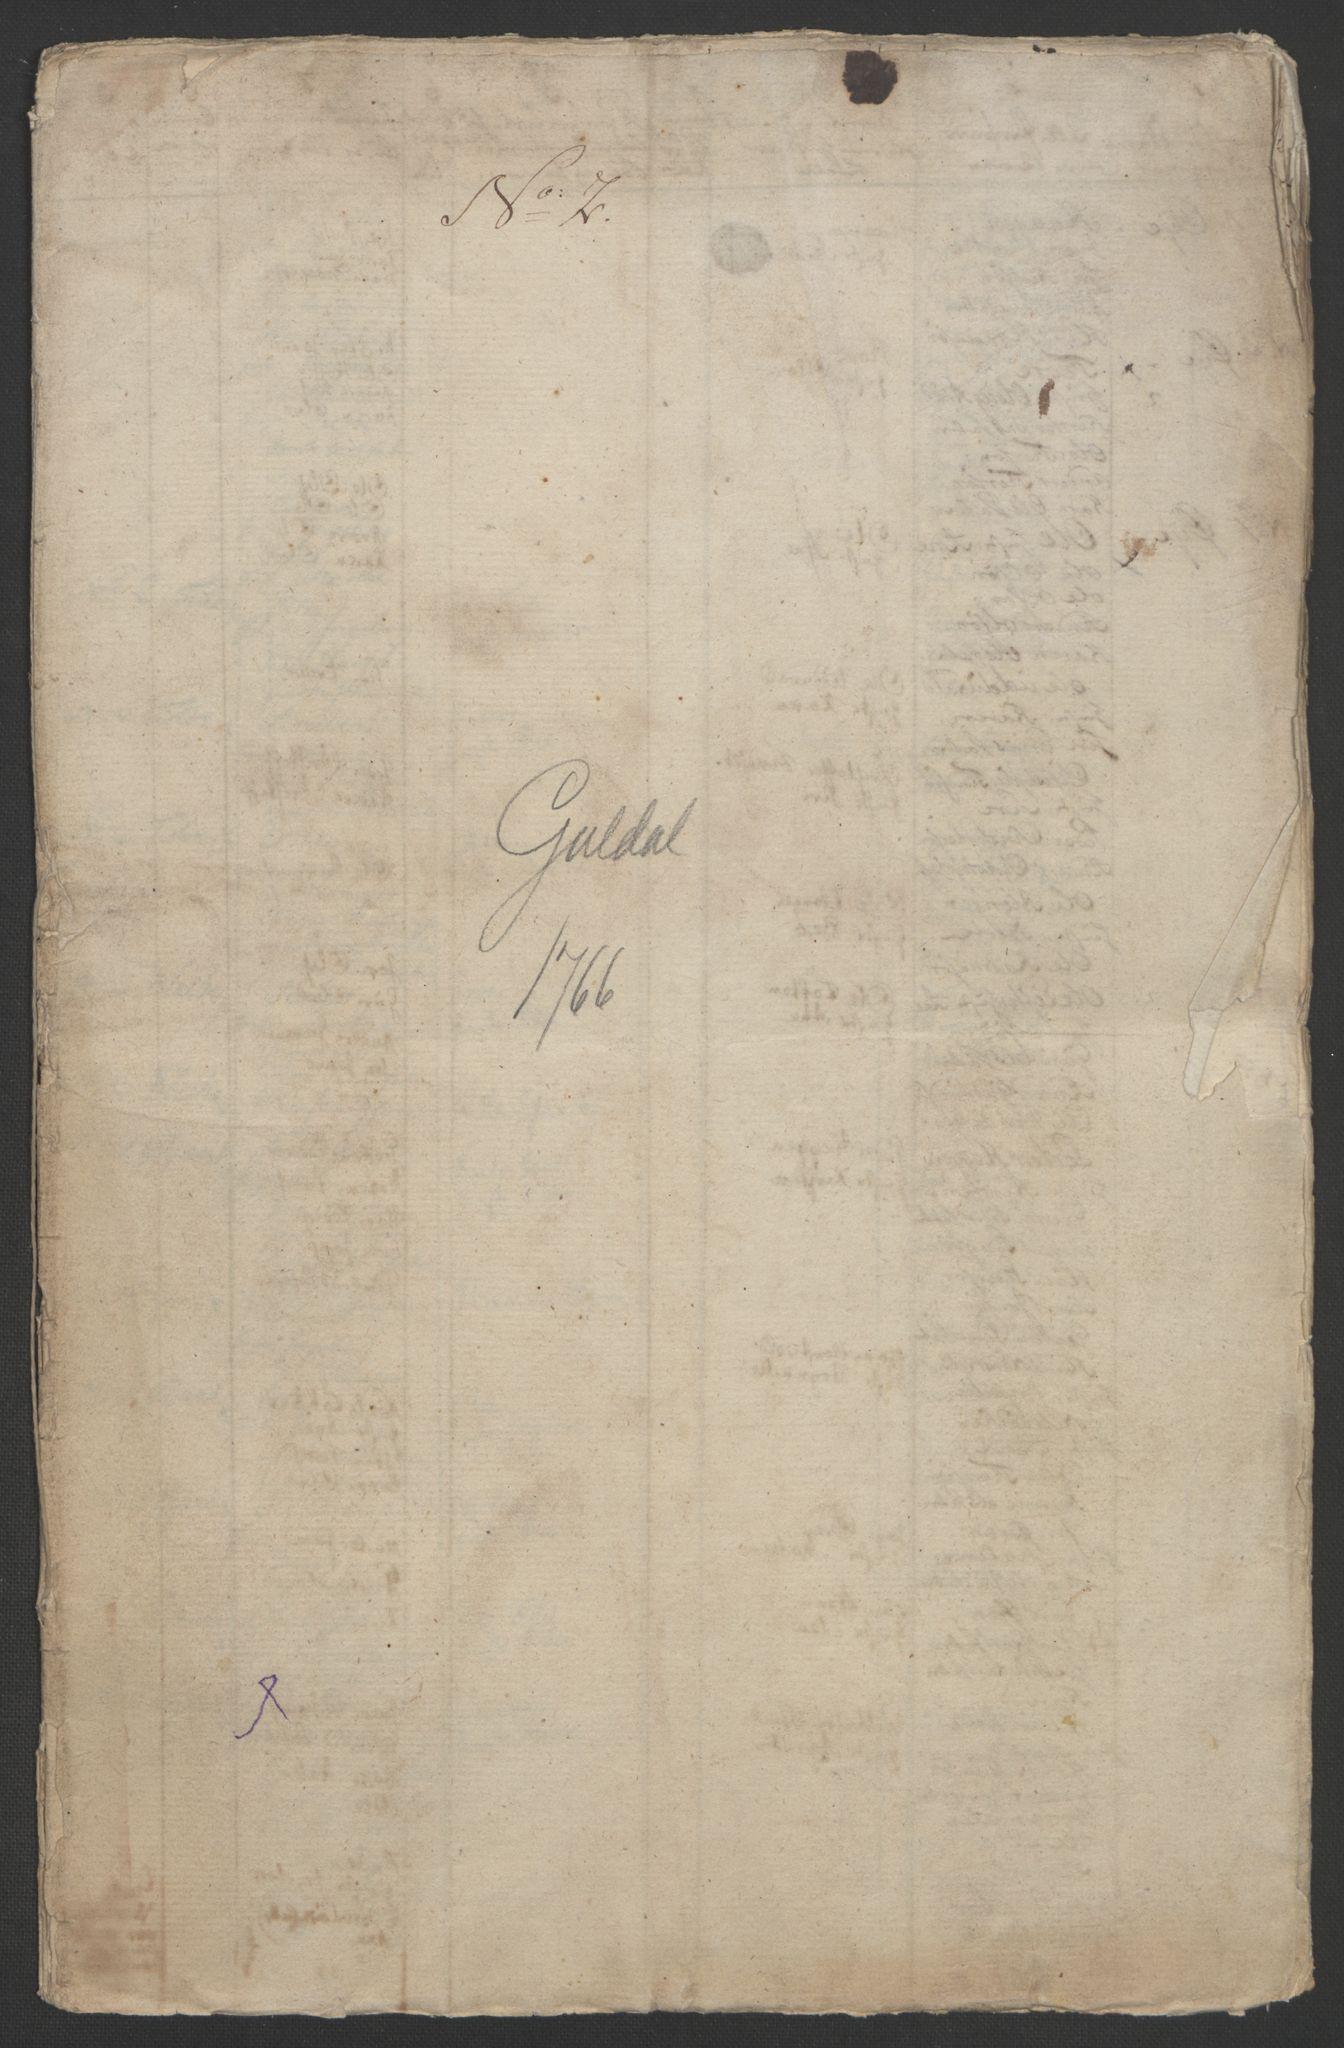 RA, Rentekammeret inntil 1814, Realistisk ordnet avdeling, Ol/L0021: [Gg 10]: Ekstraskatten, 23.09.1762. Orkdal og Gauldal, 1762-1767, s. 516